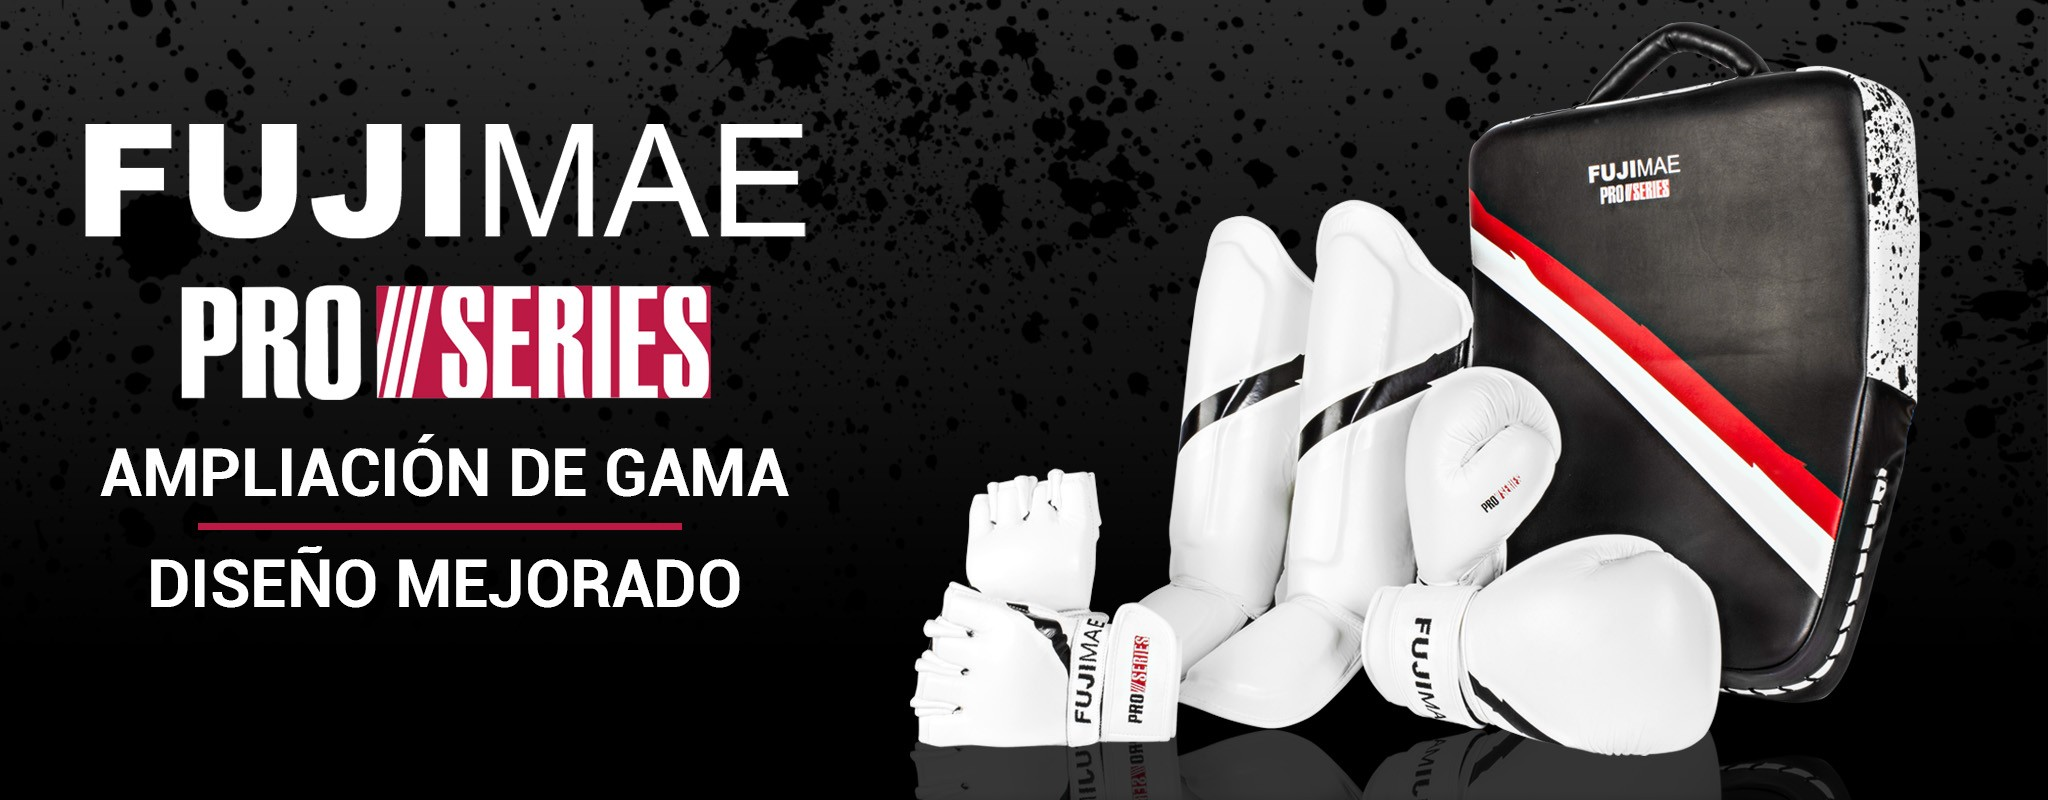 Gama ProSeries